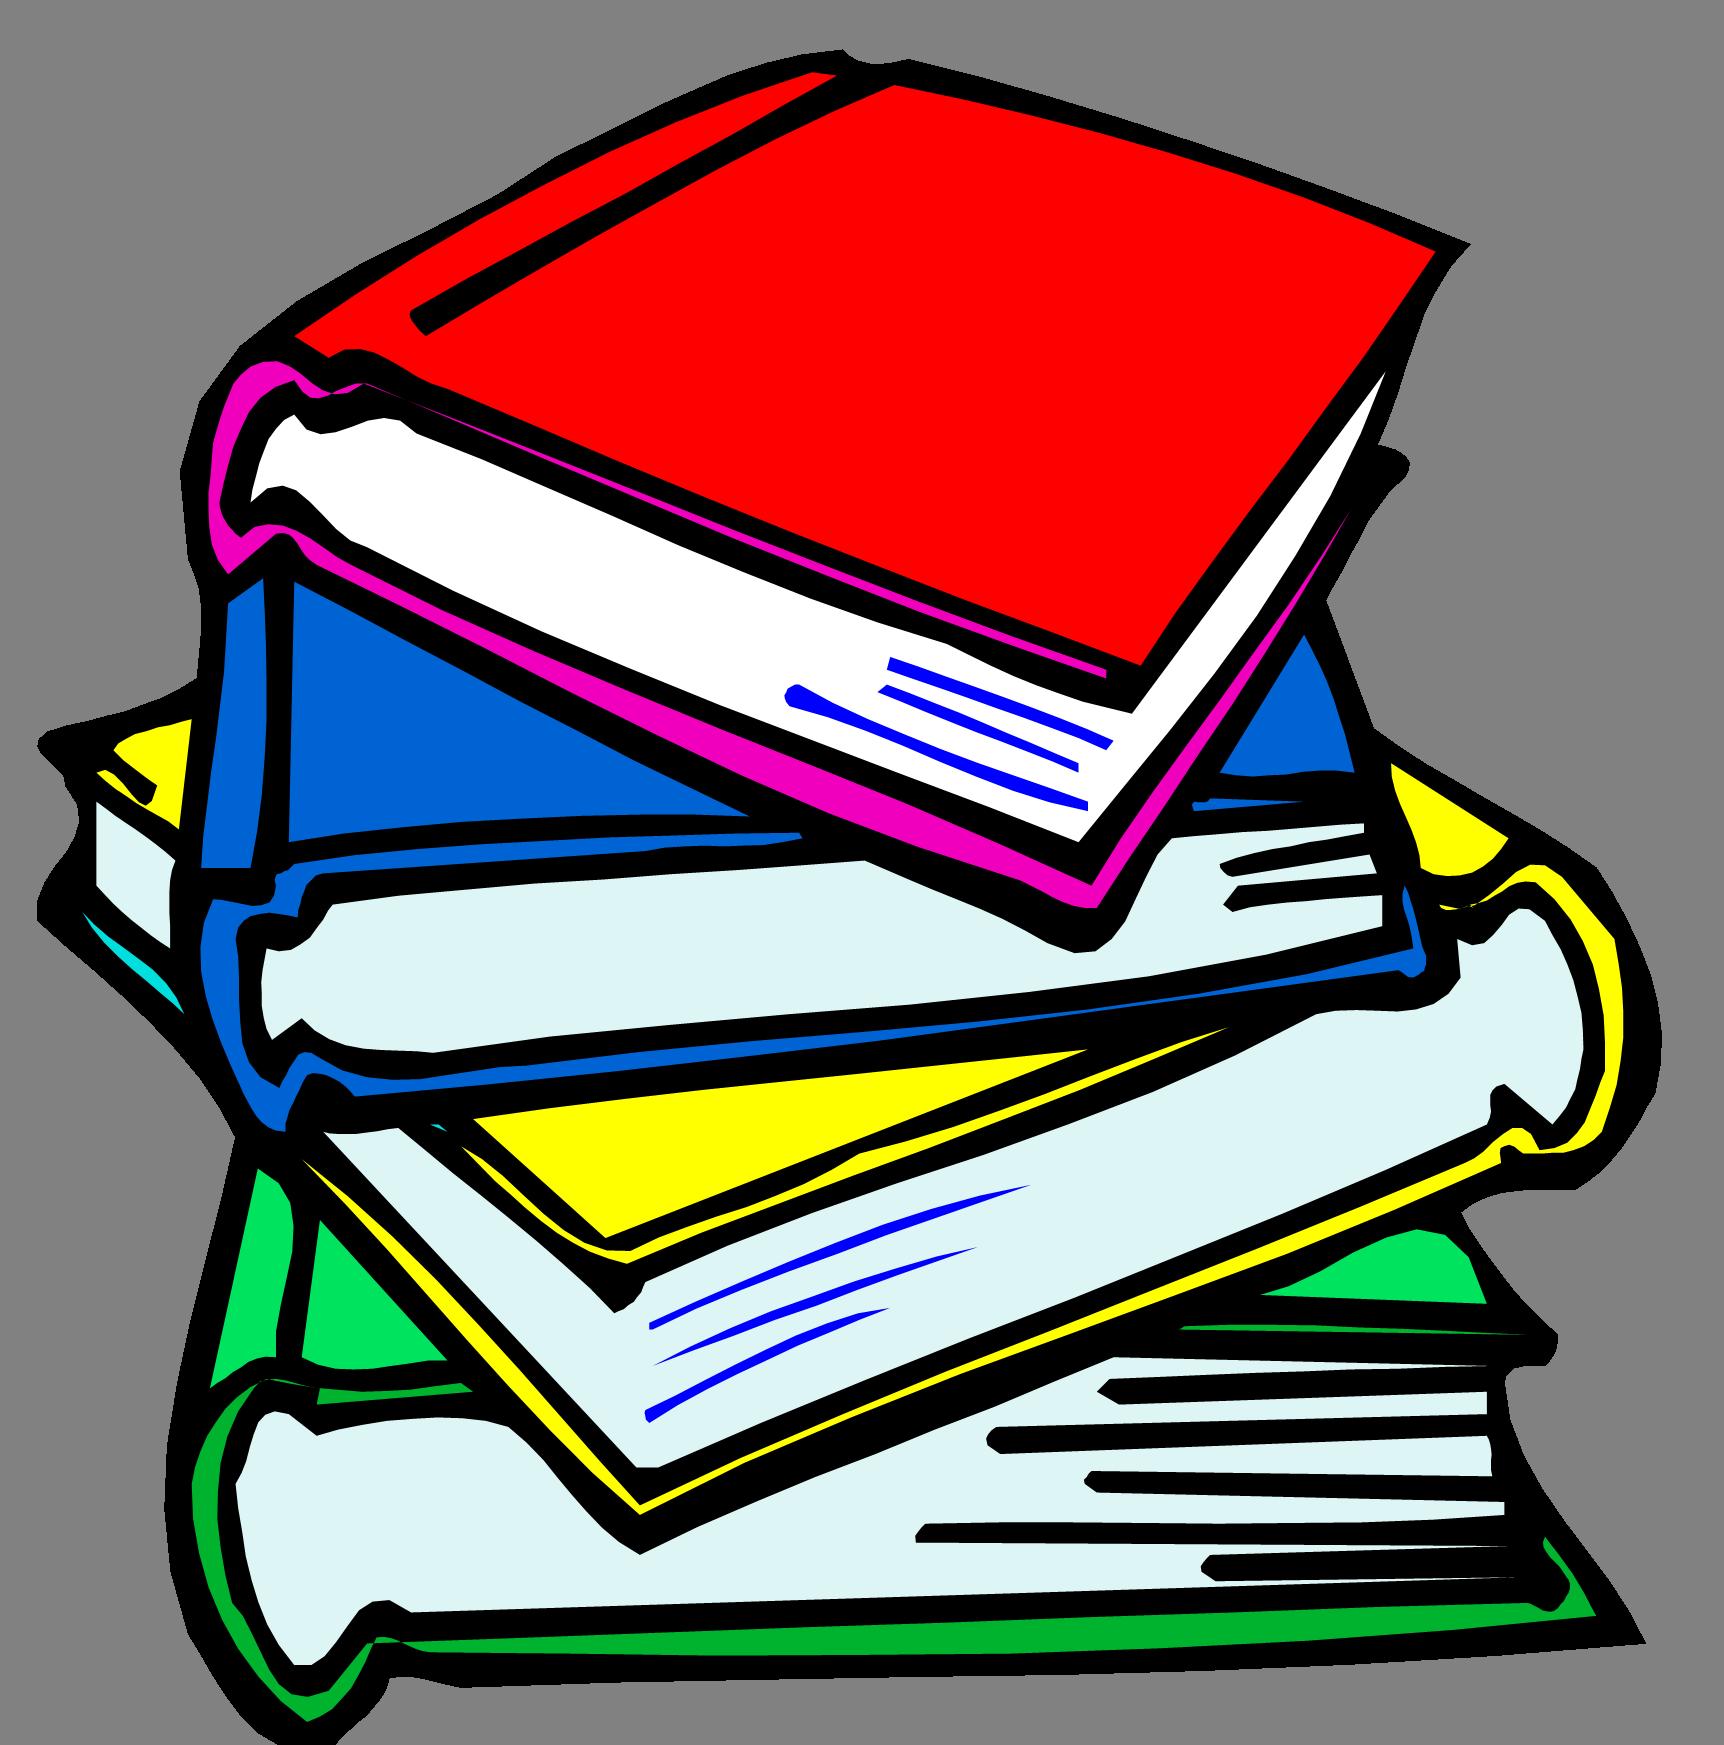 School Book Pictures - School Books Clipart